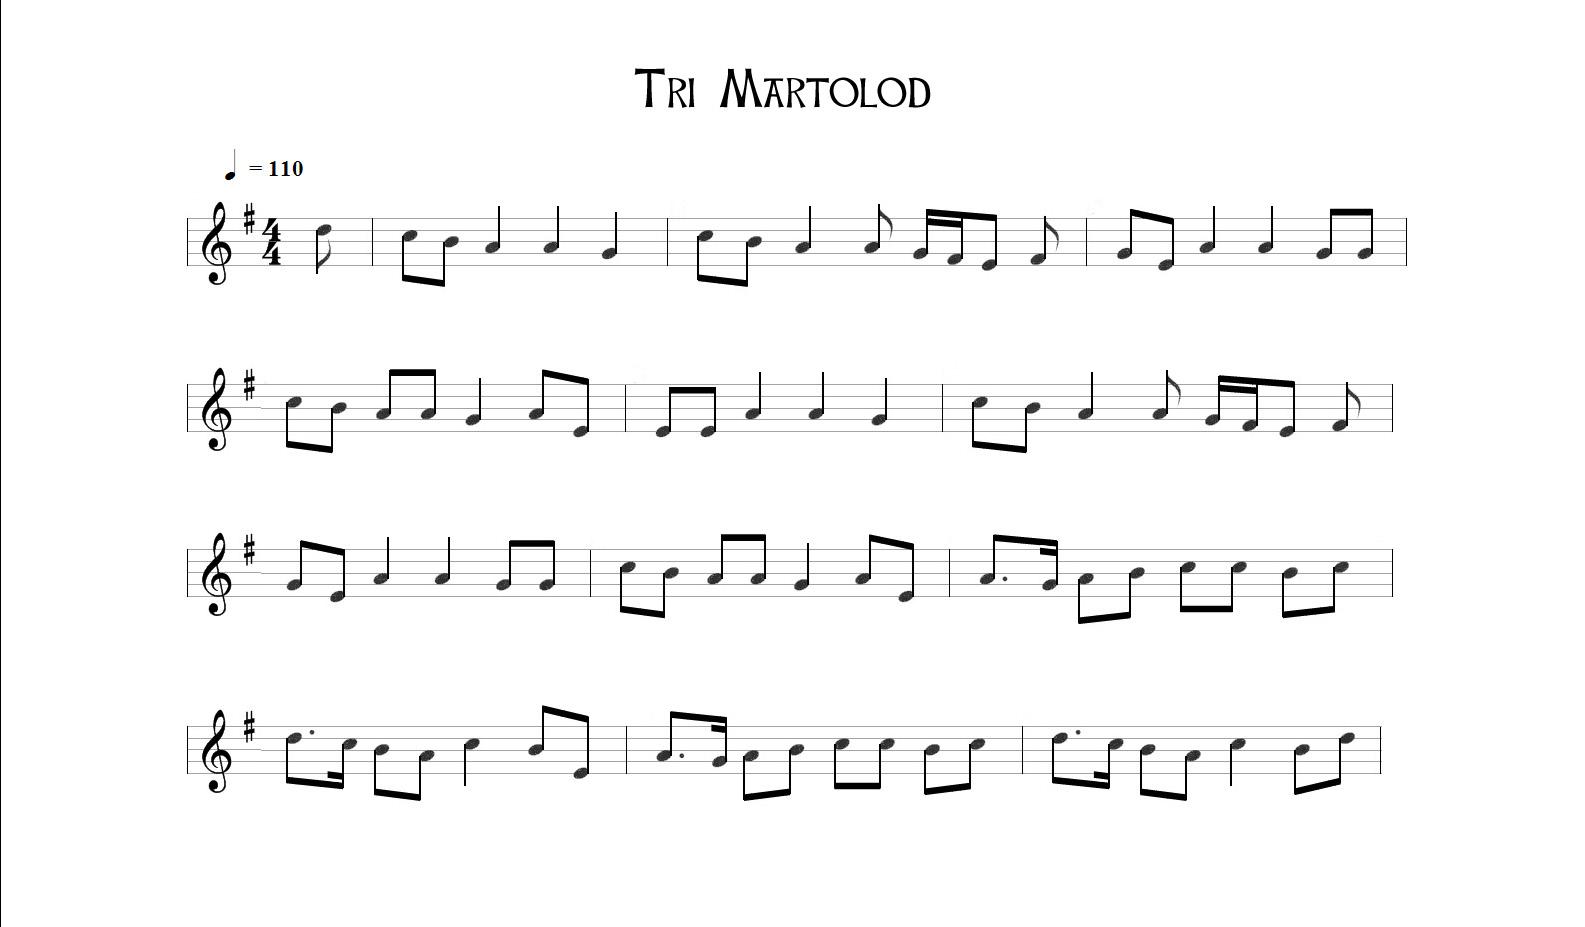 Tri Martolod